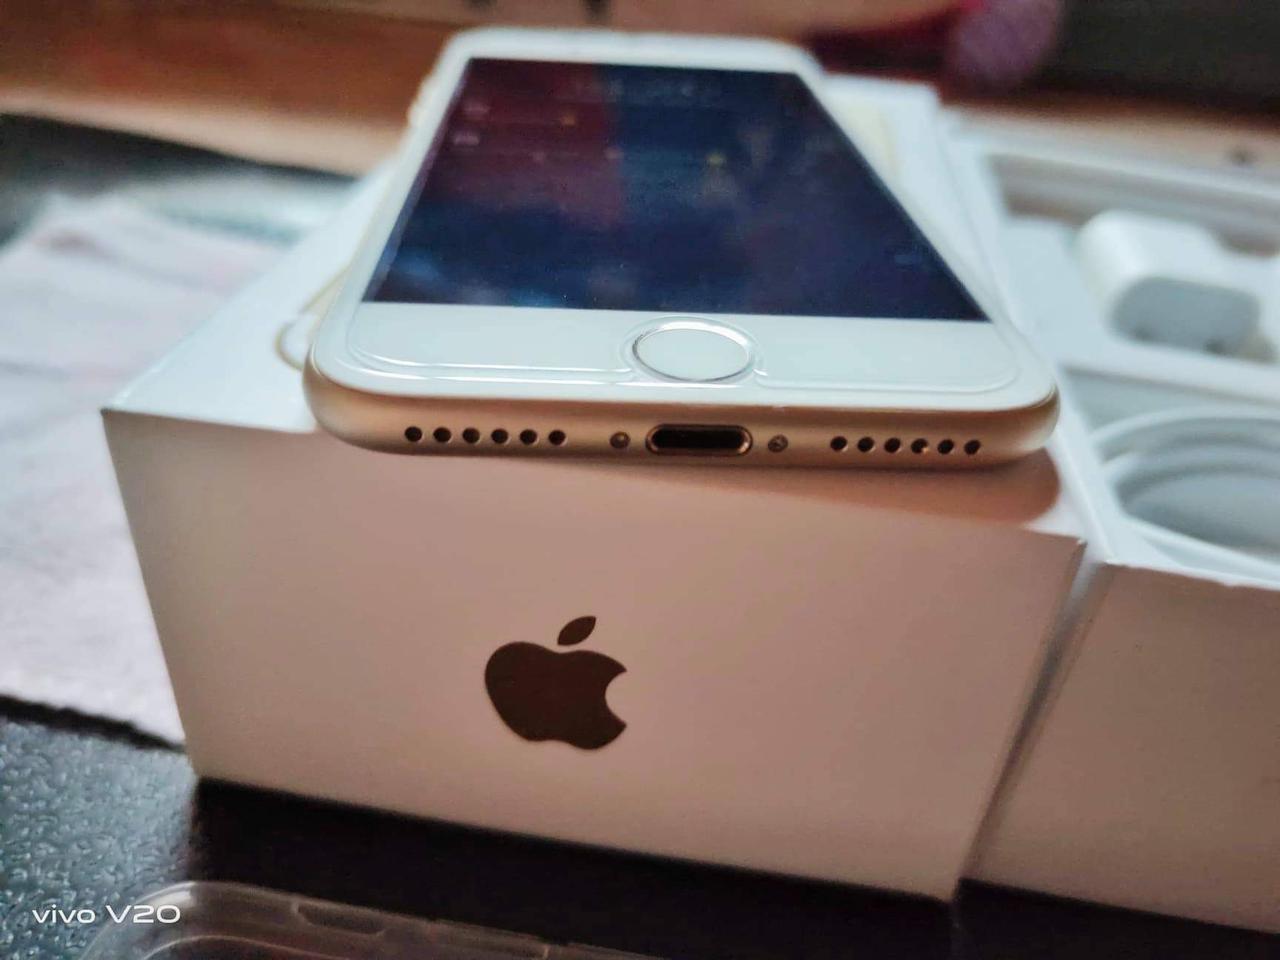 iPhone7 มือสอง 128G สีทอง รูปที่ 3